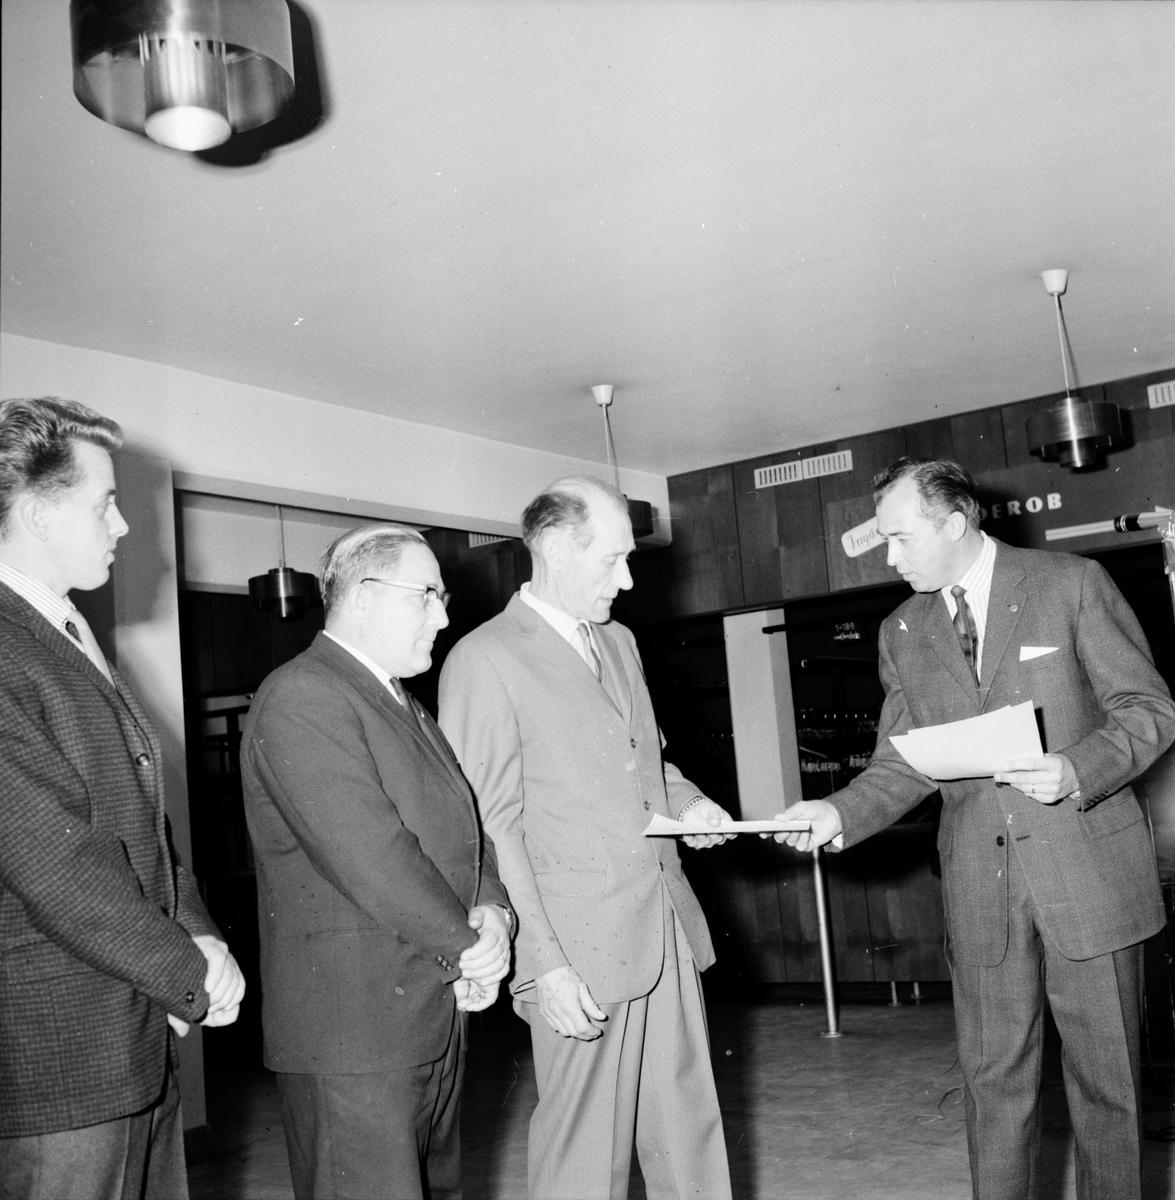 Lionklubbens Mannekänguppvisning, 15 Nov 1964